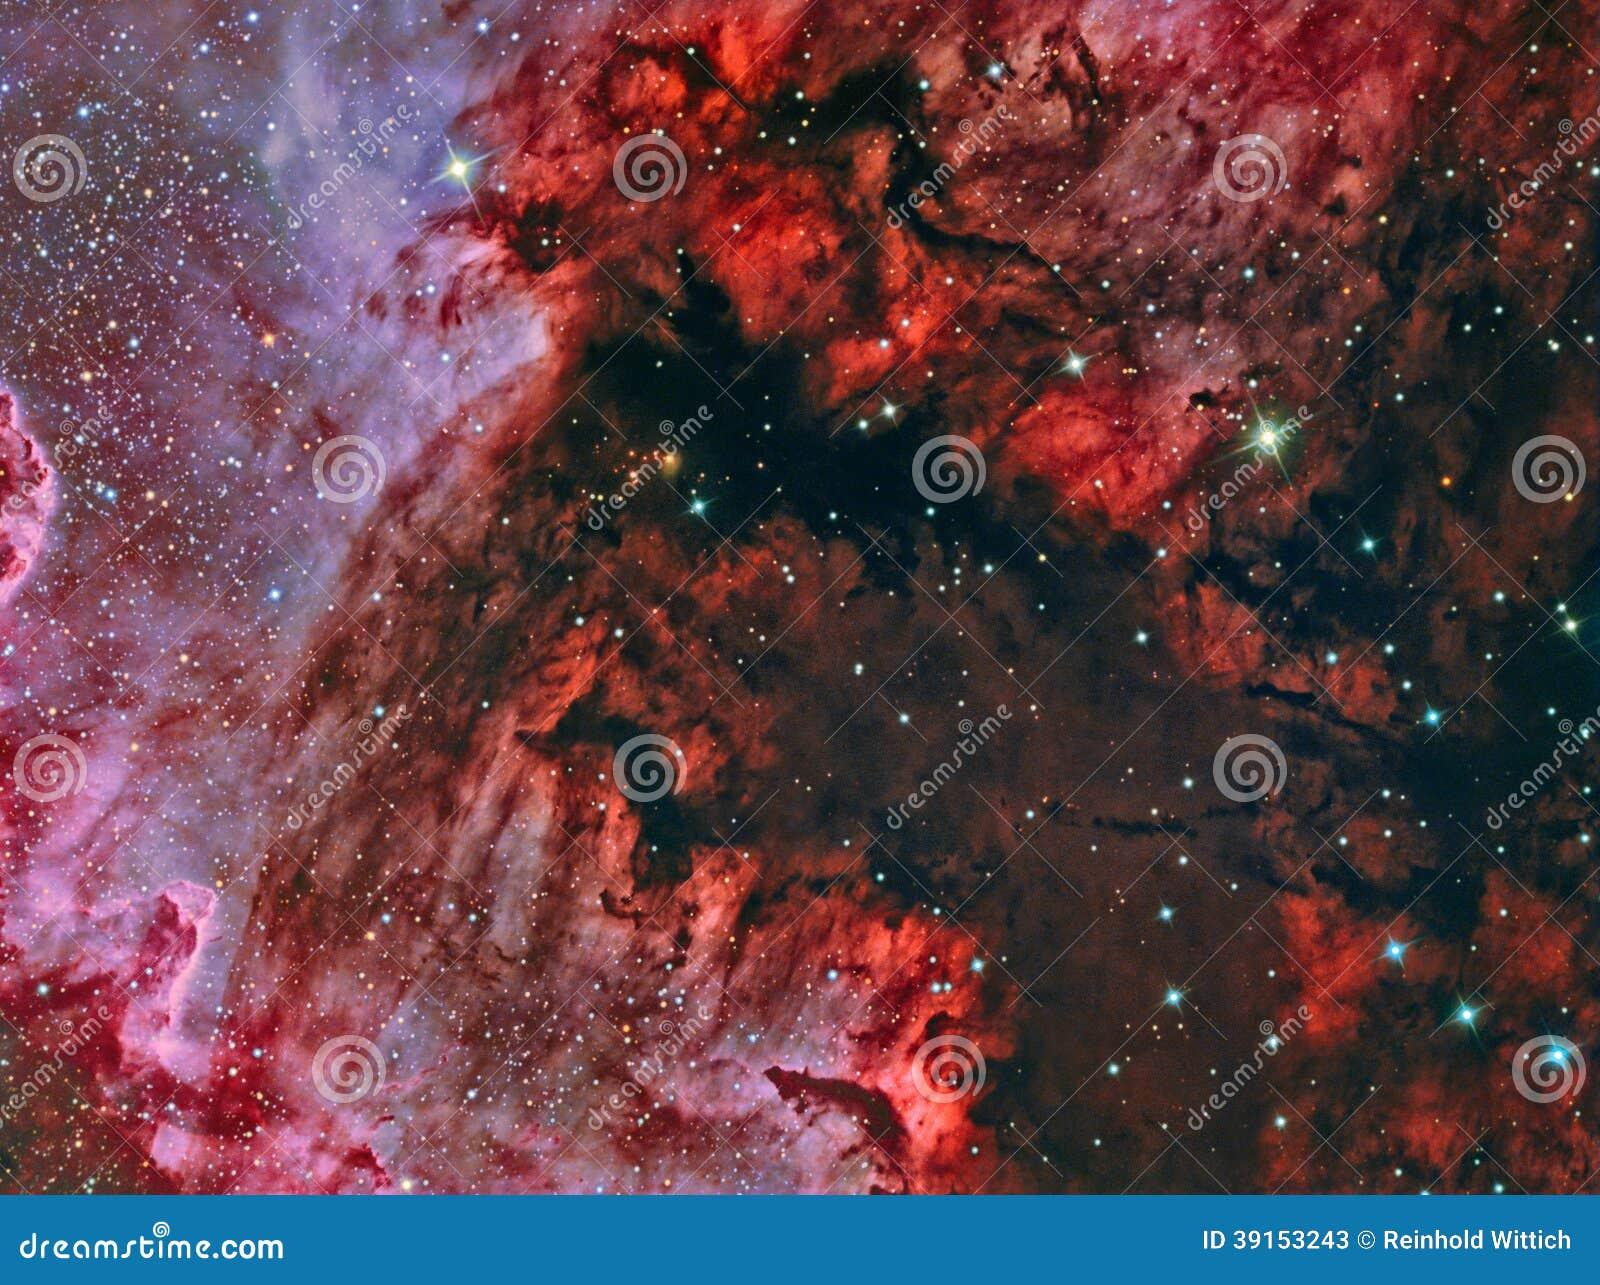 Das Golf von Mexiko im Nordamerika-Nebelfleck NGC 7000